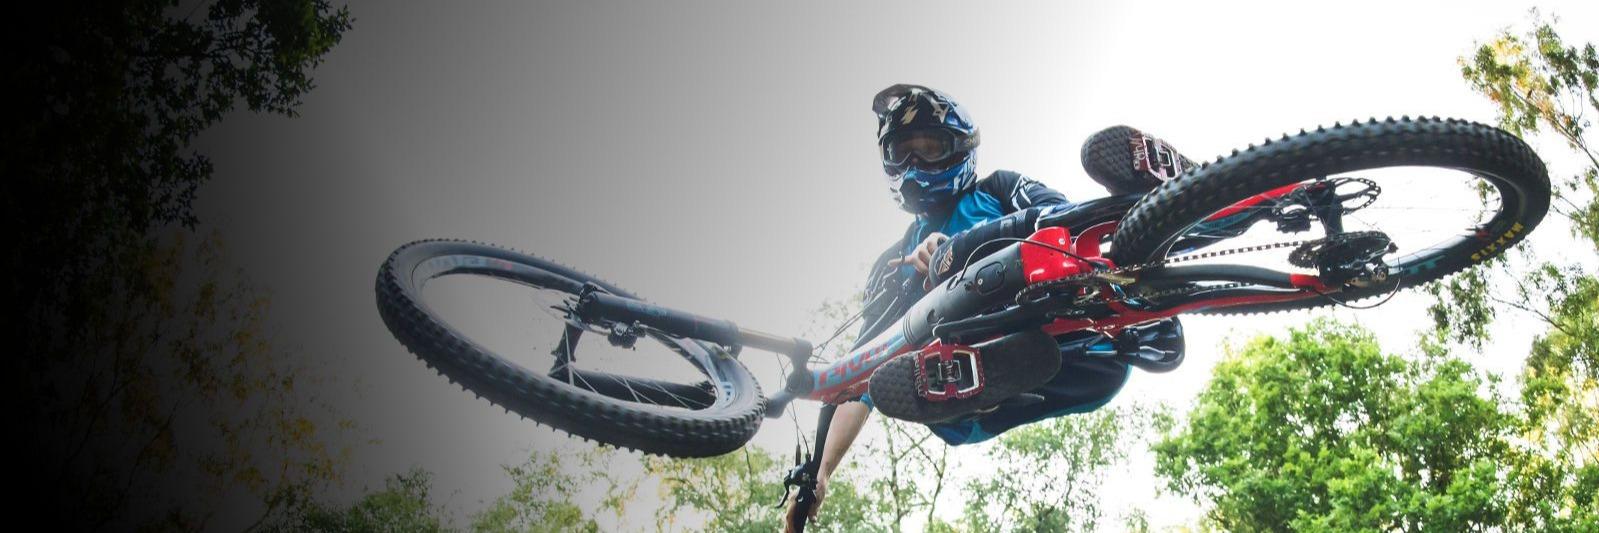 Mountain biker catching air on a Pivot.